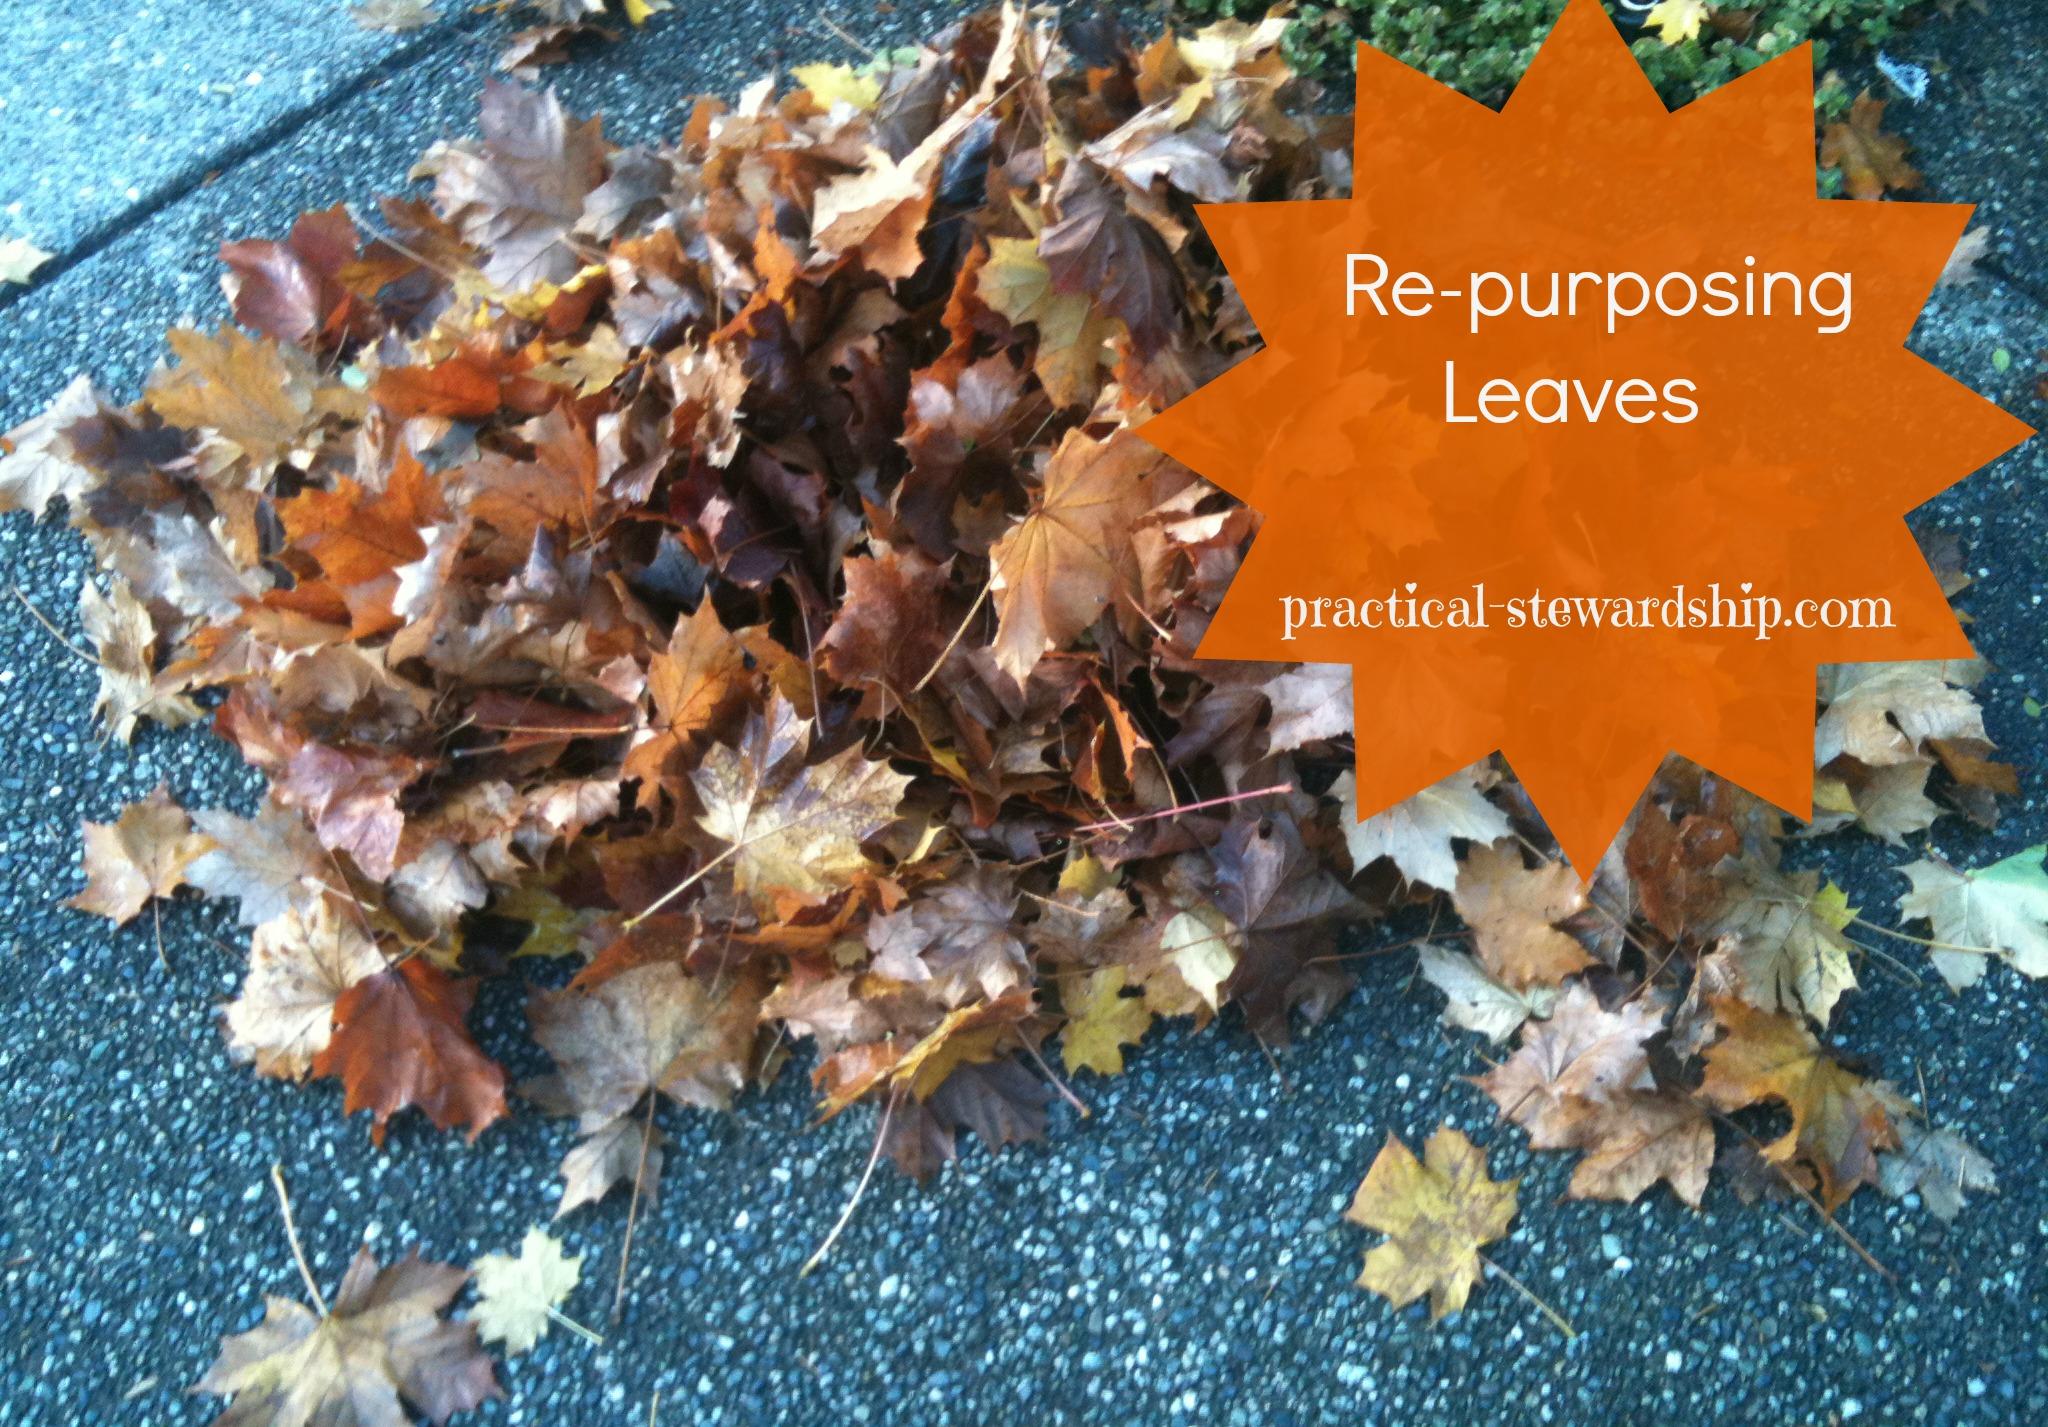 Re-purposing Leaves to Keep Down Those Weeds